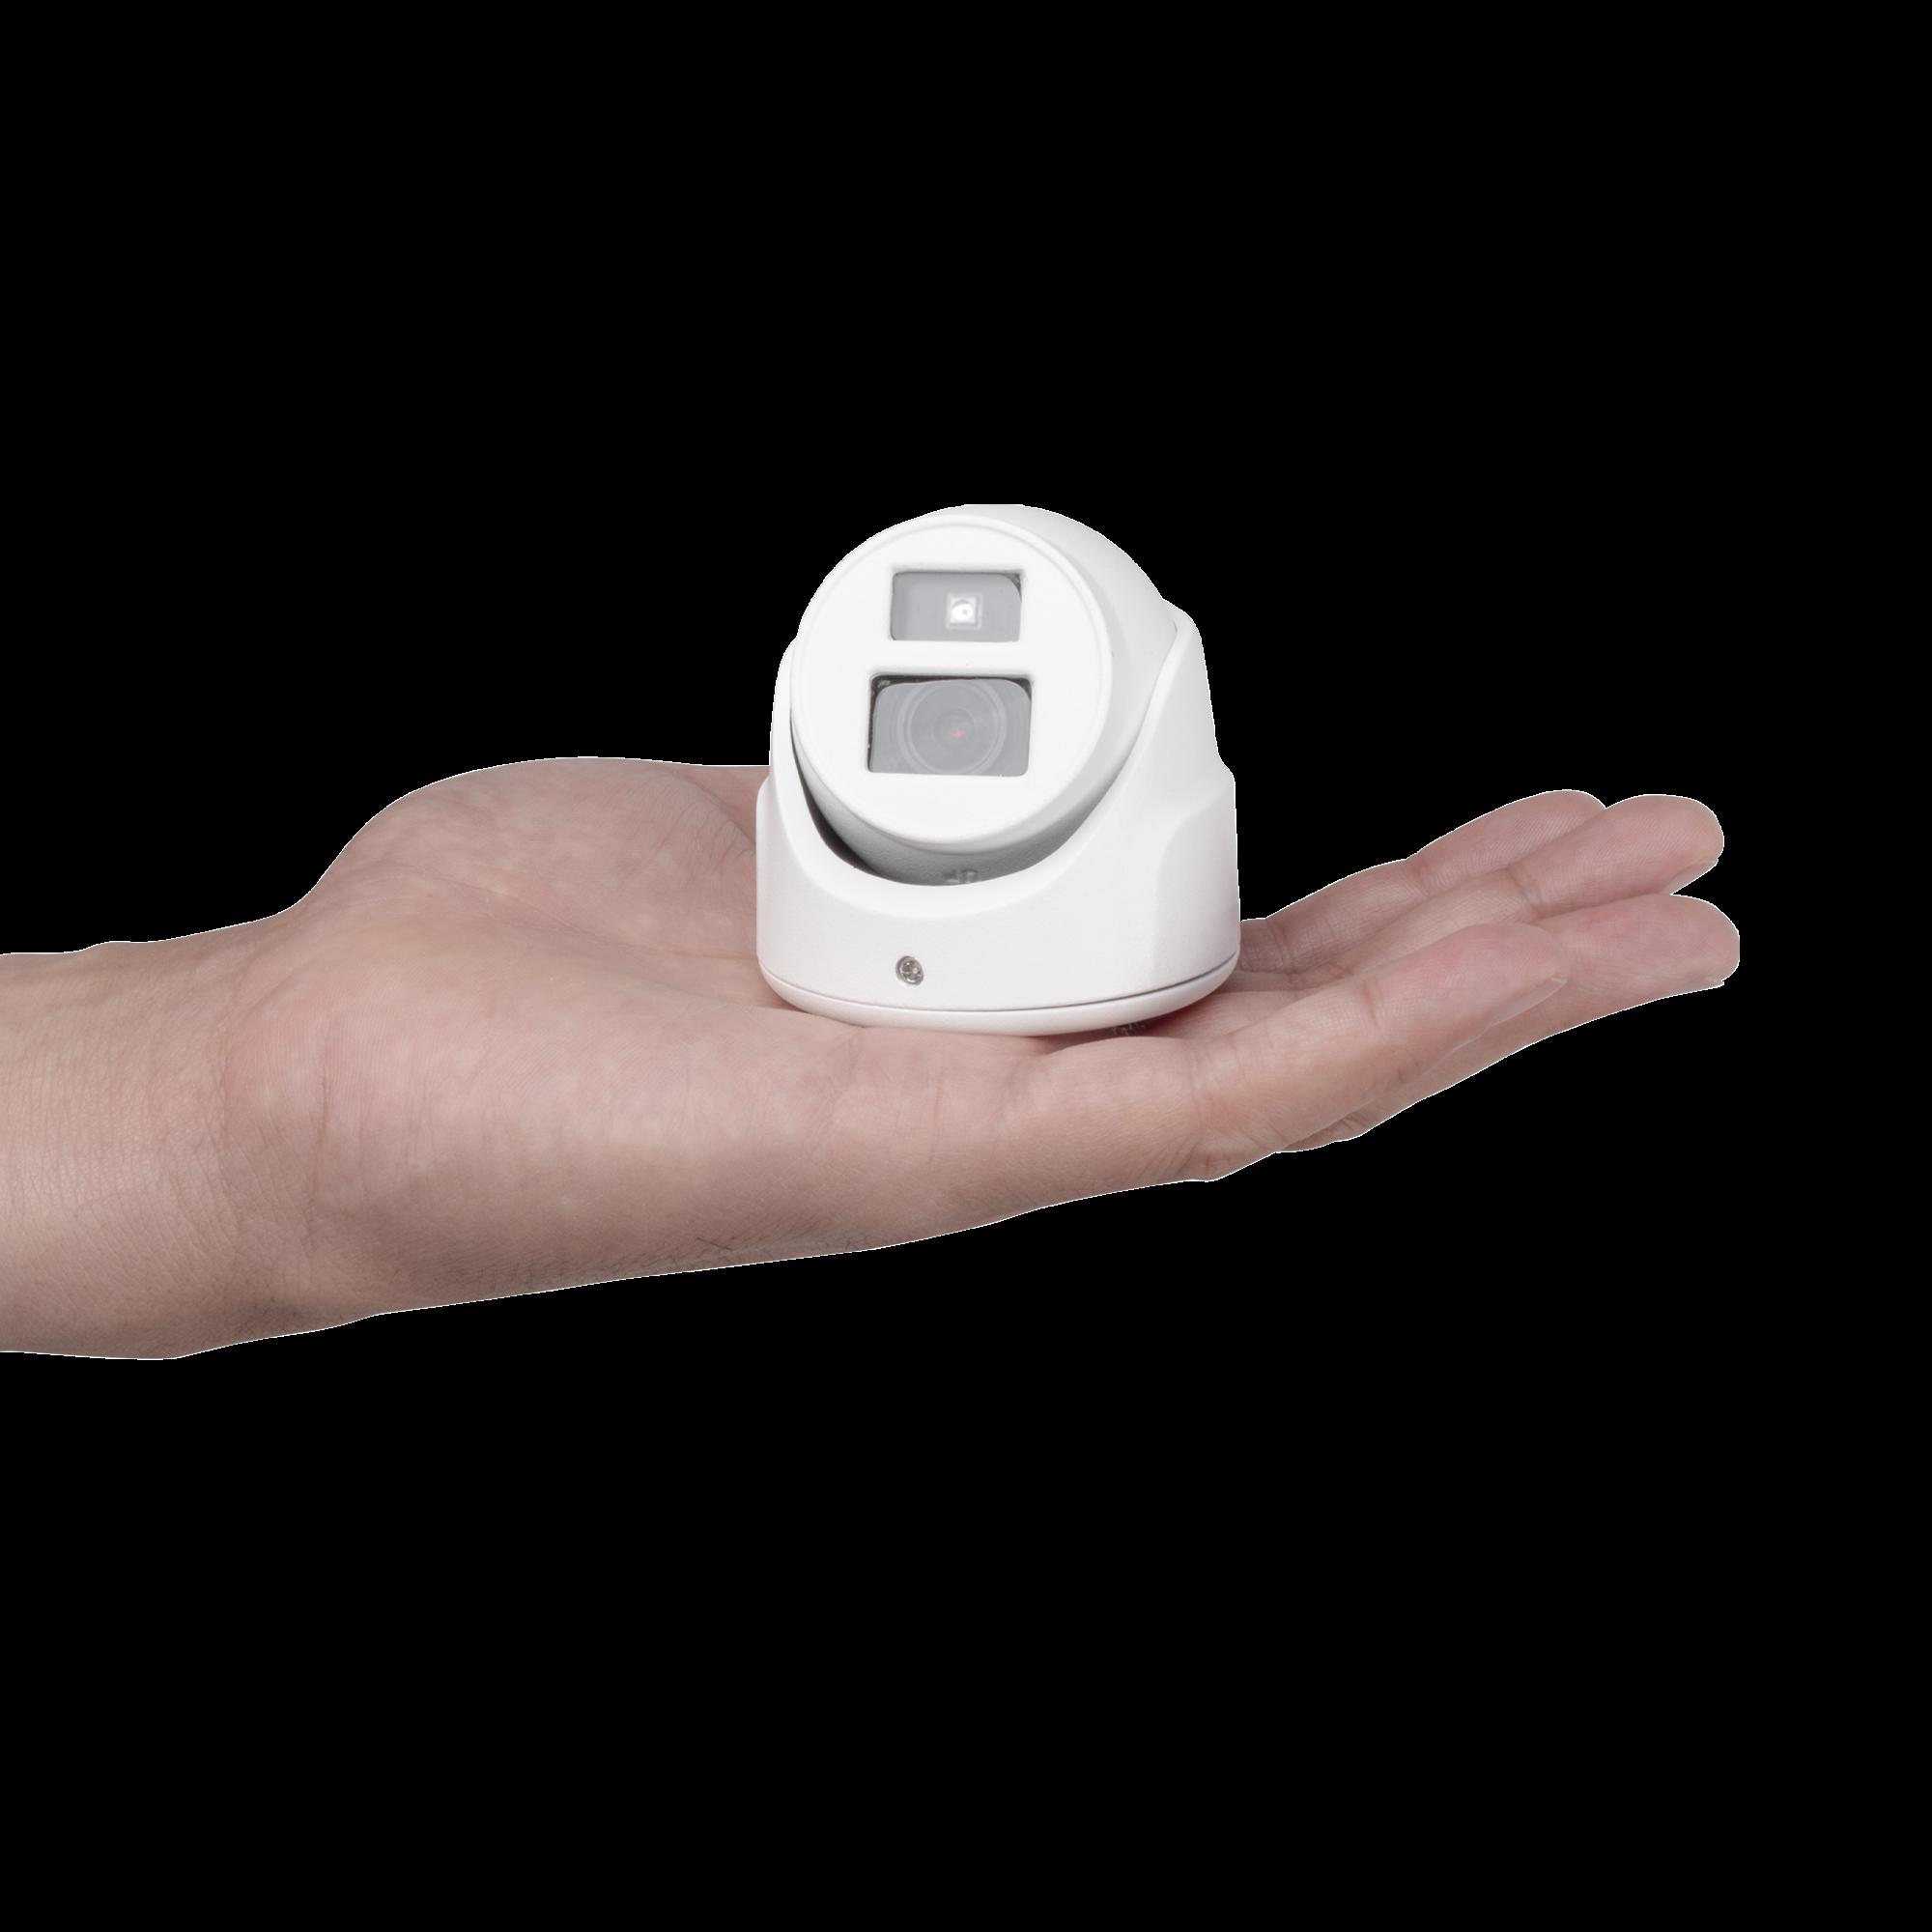 Ultra Mini Turret TURBO 1080p / Gran Angular / Lente 2.8 mm / 20 mts IR EXIR / Exterior IP67 / 4 Tecnologías (TVI / AHD / CVBS) / dWDR